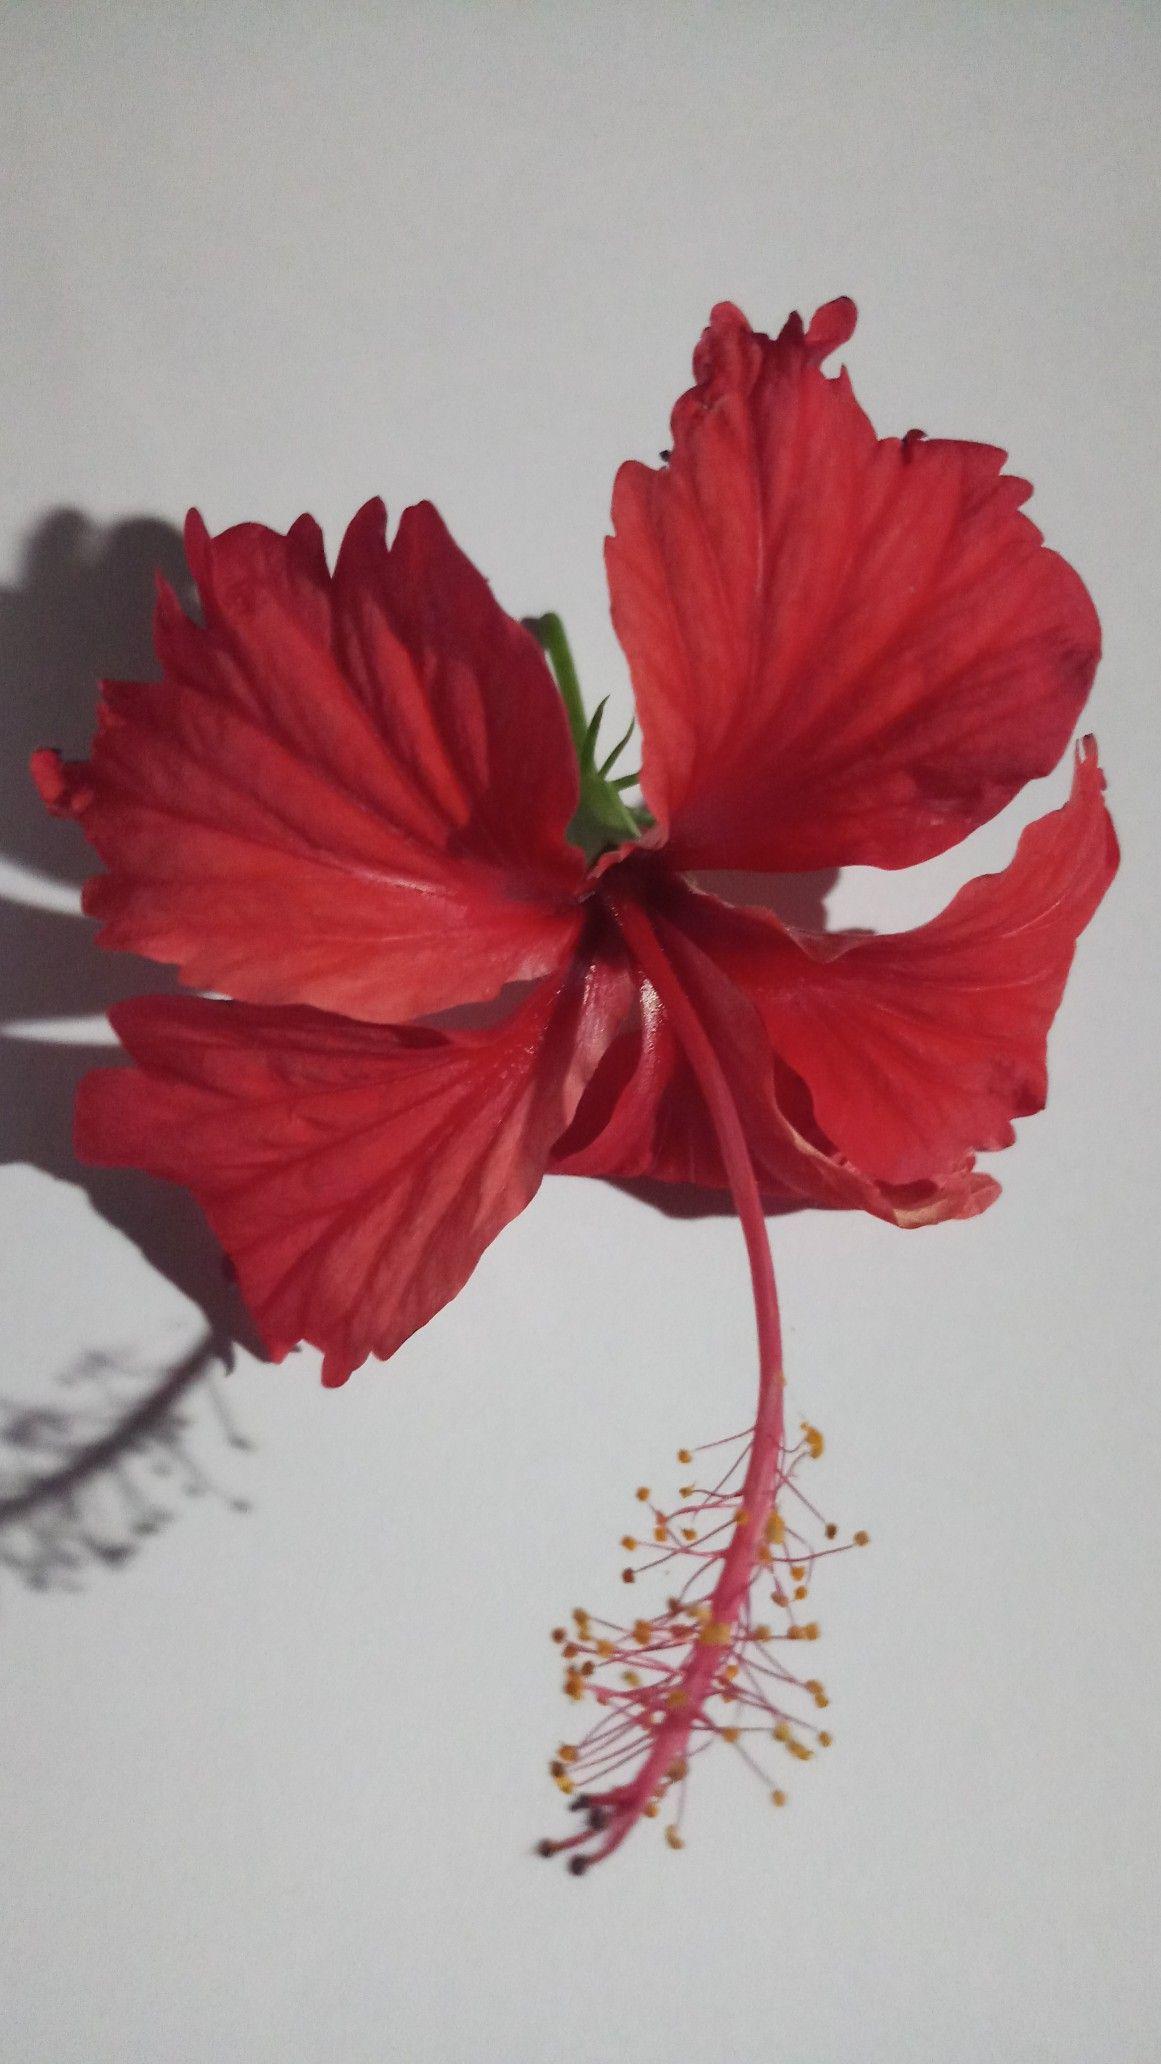 Pin By Bablu Mandal On 11 In 2020 Maple Leaf Tattoo Leaf